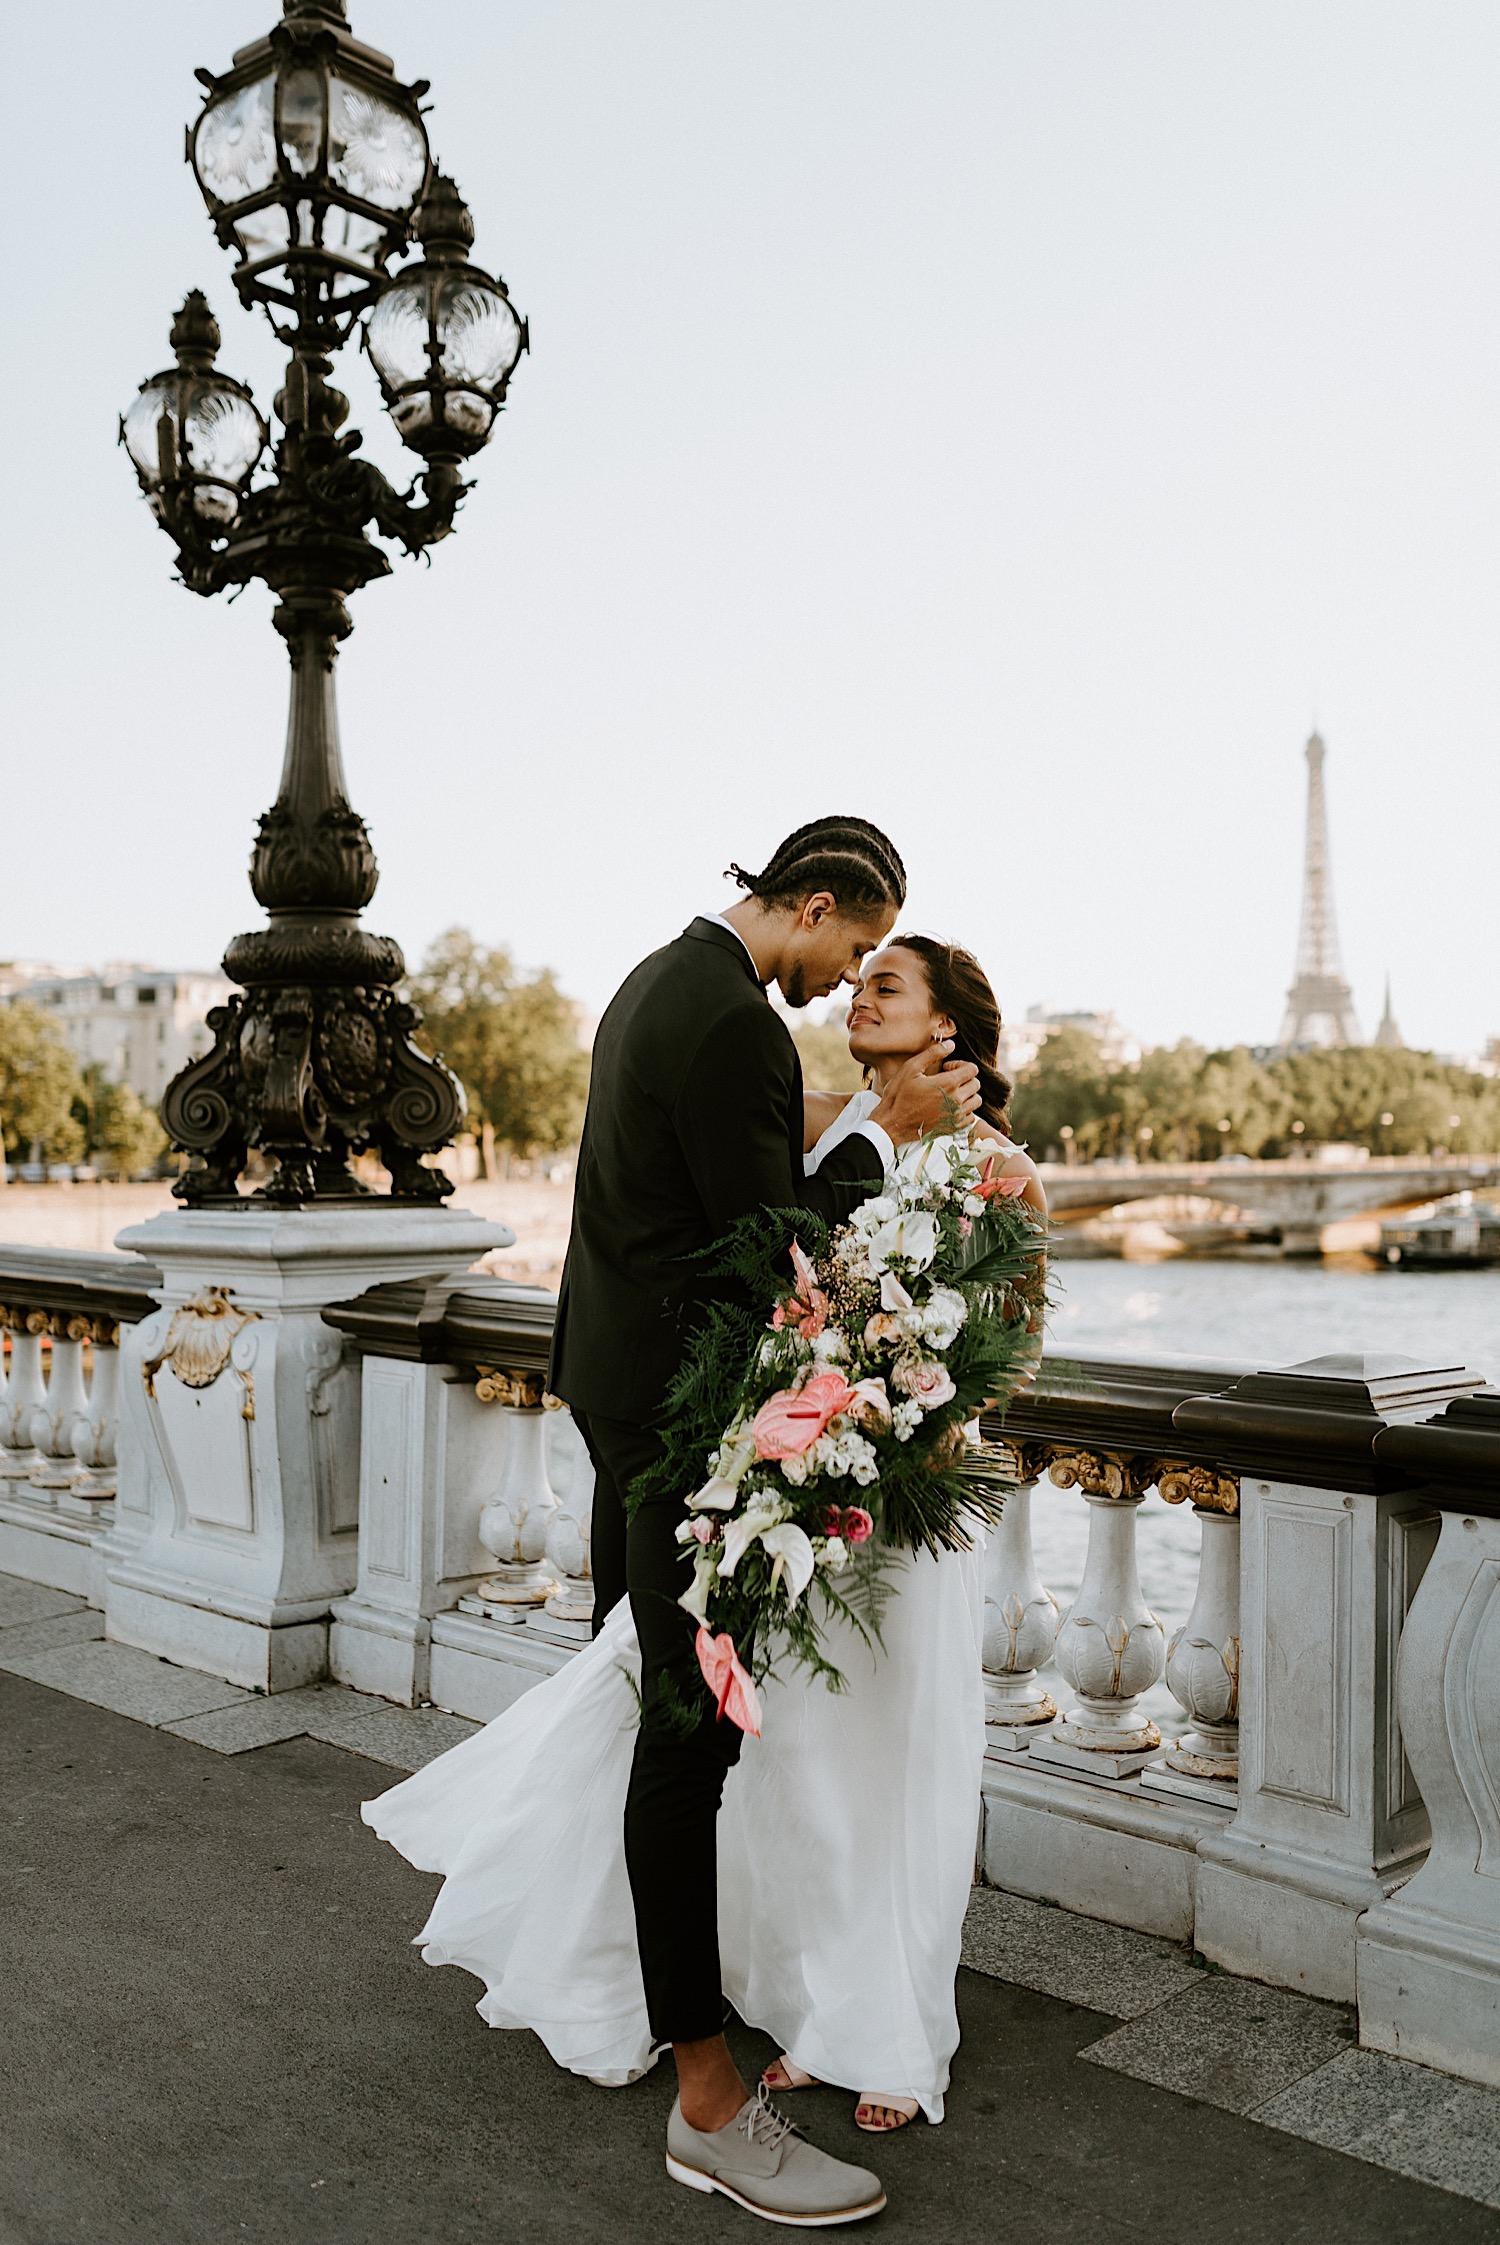 Paris Wedding Photos Paris Wedding Photographer Paris Photographe De Marriage Pont Alexandre Wedding Photos Anais Possamai Photography 27